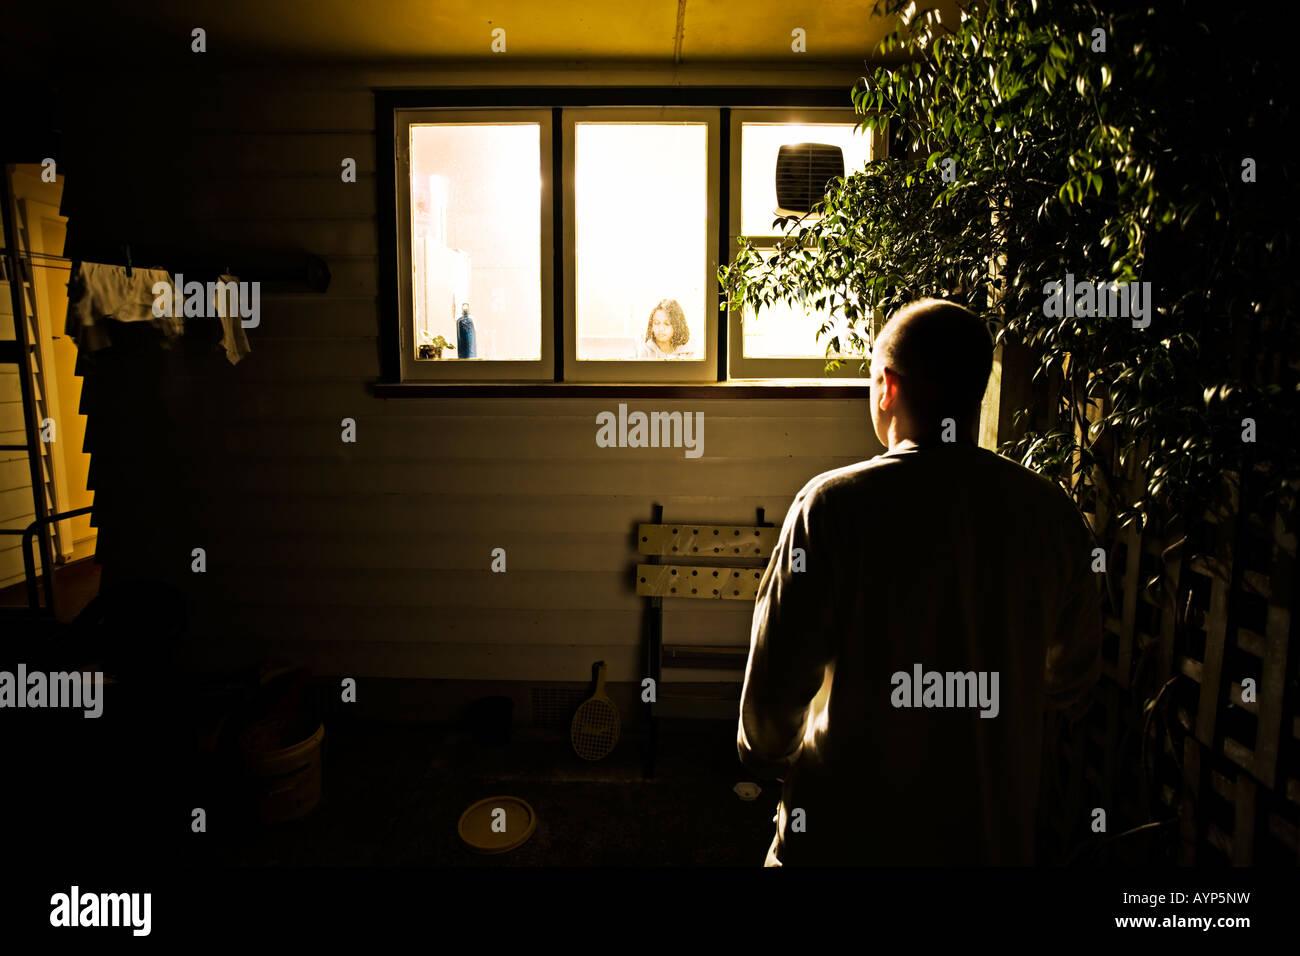 Man watches woman through kitchen window at night - Stock Image